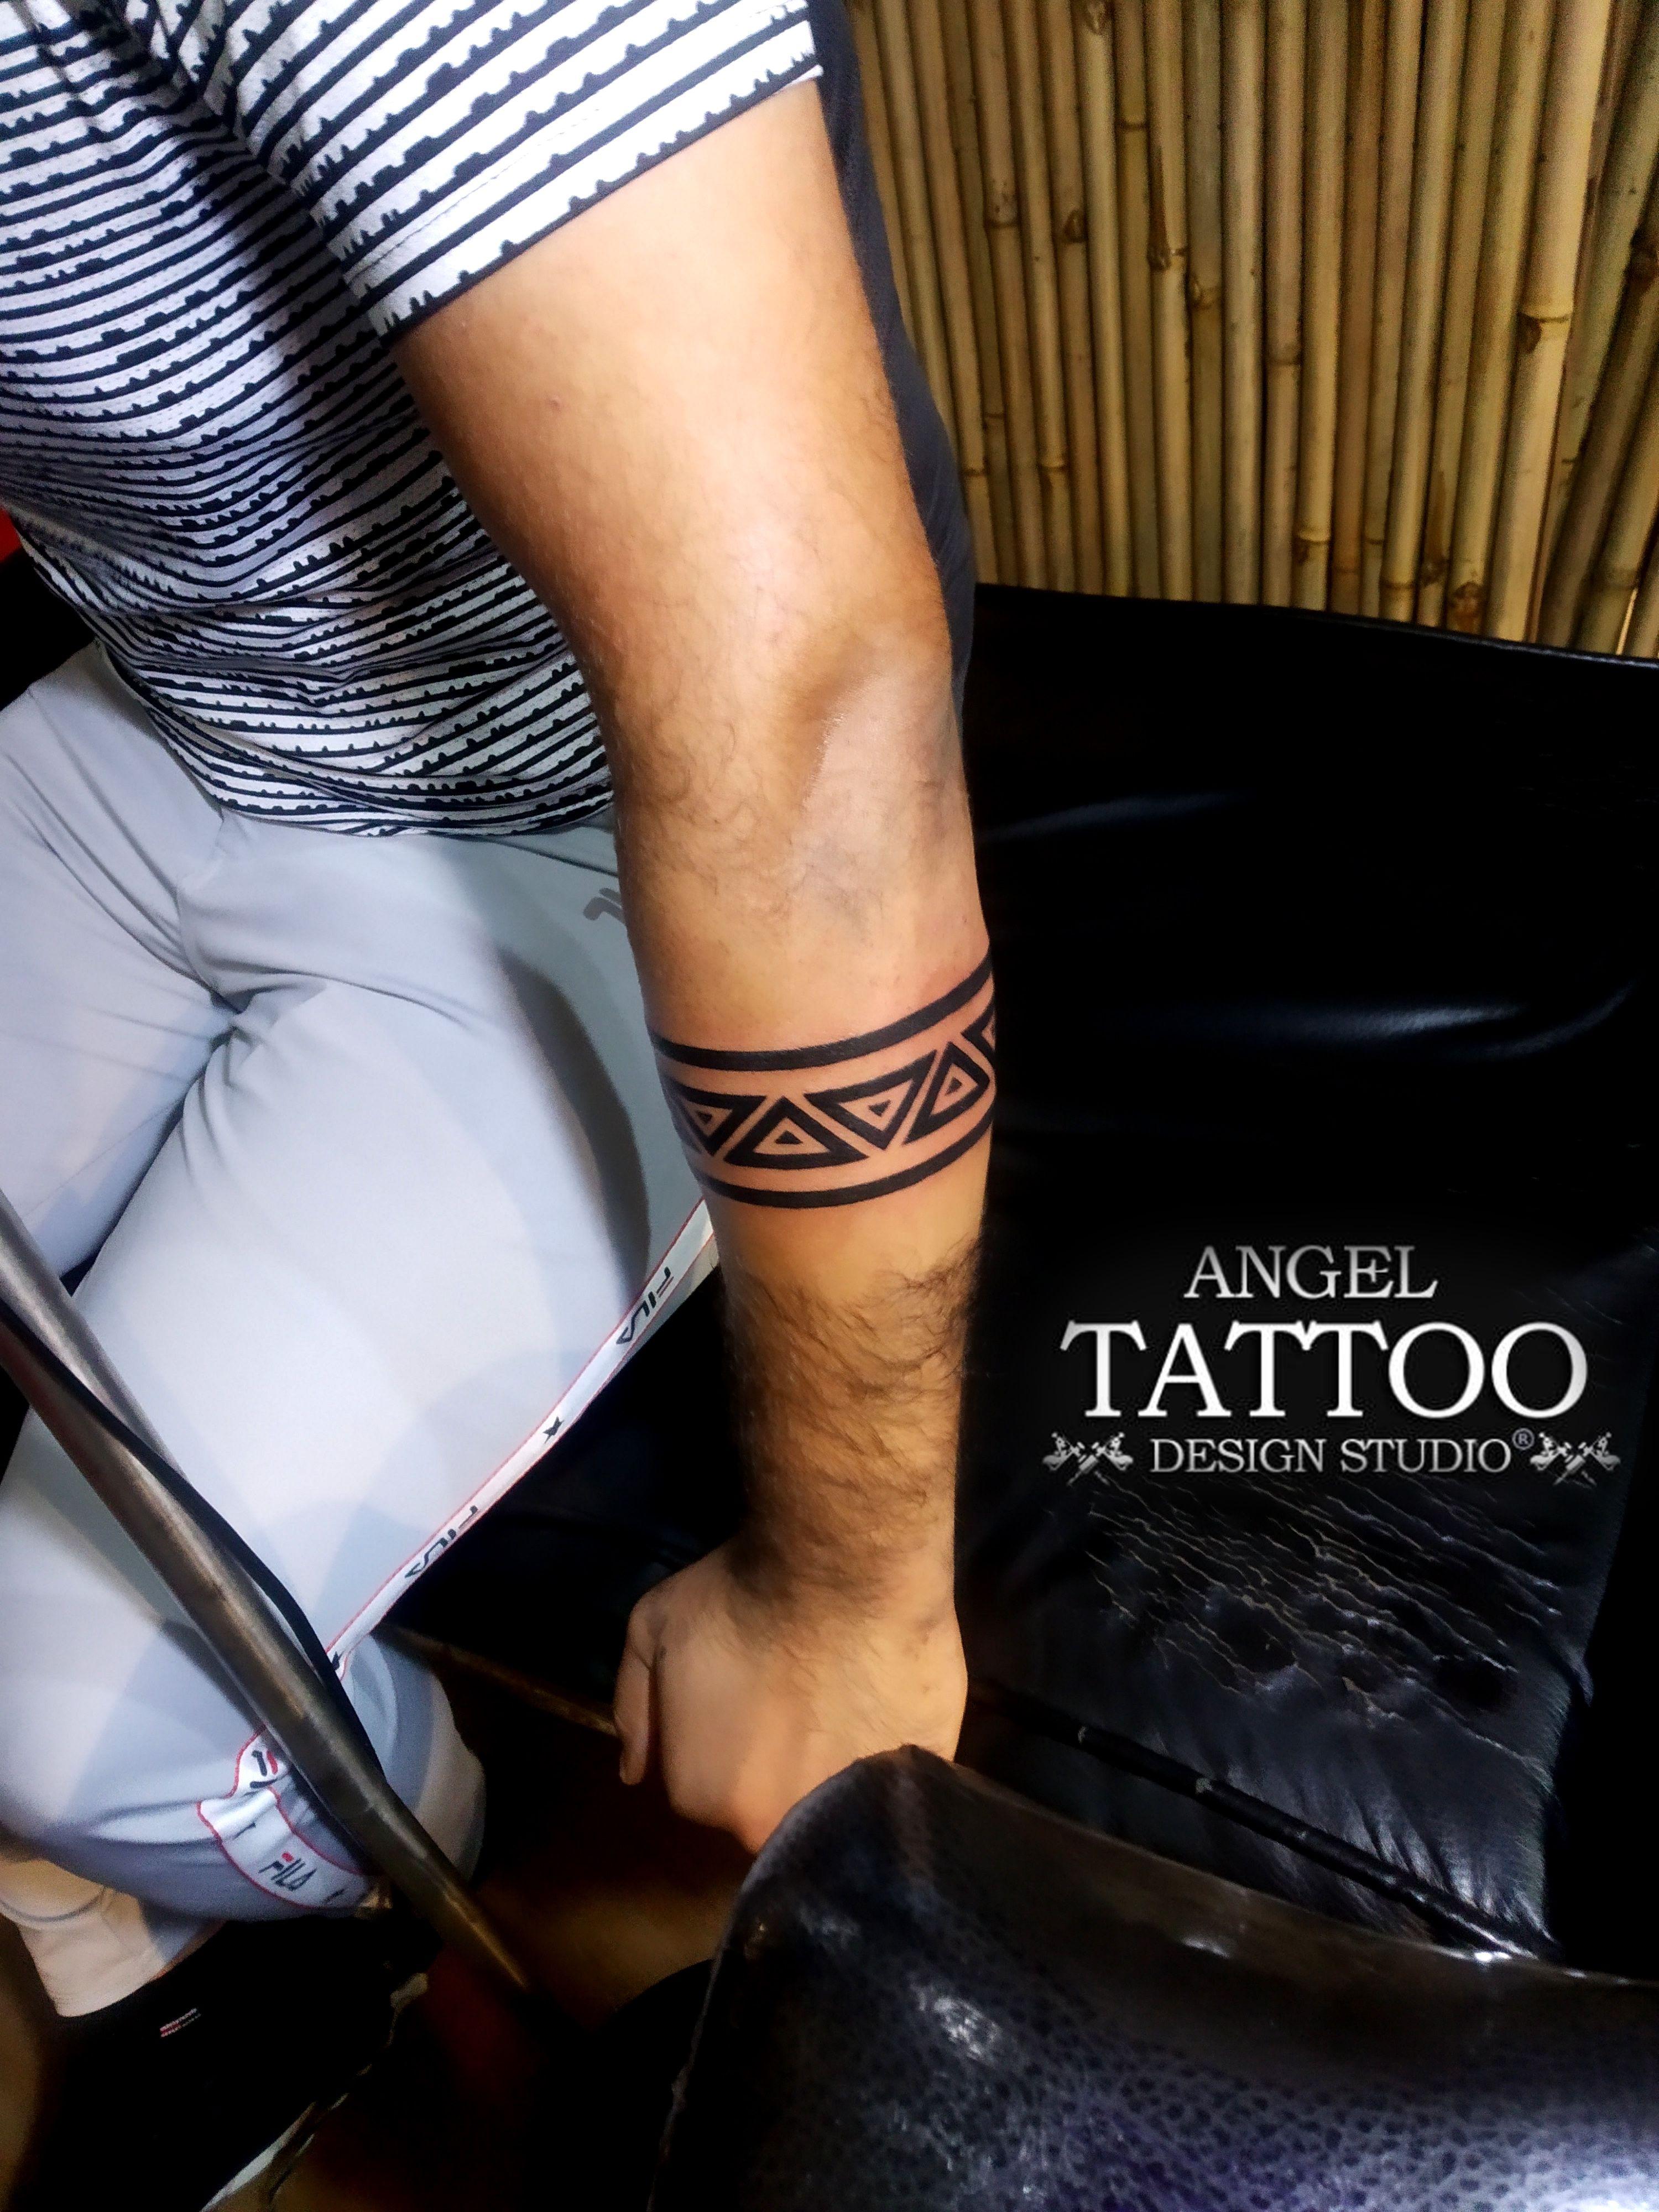 Armband Tattoo In 2020 Forearm Band Tattoos Band Tattoo Designs Wrist Band Tattoo